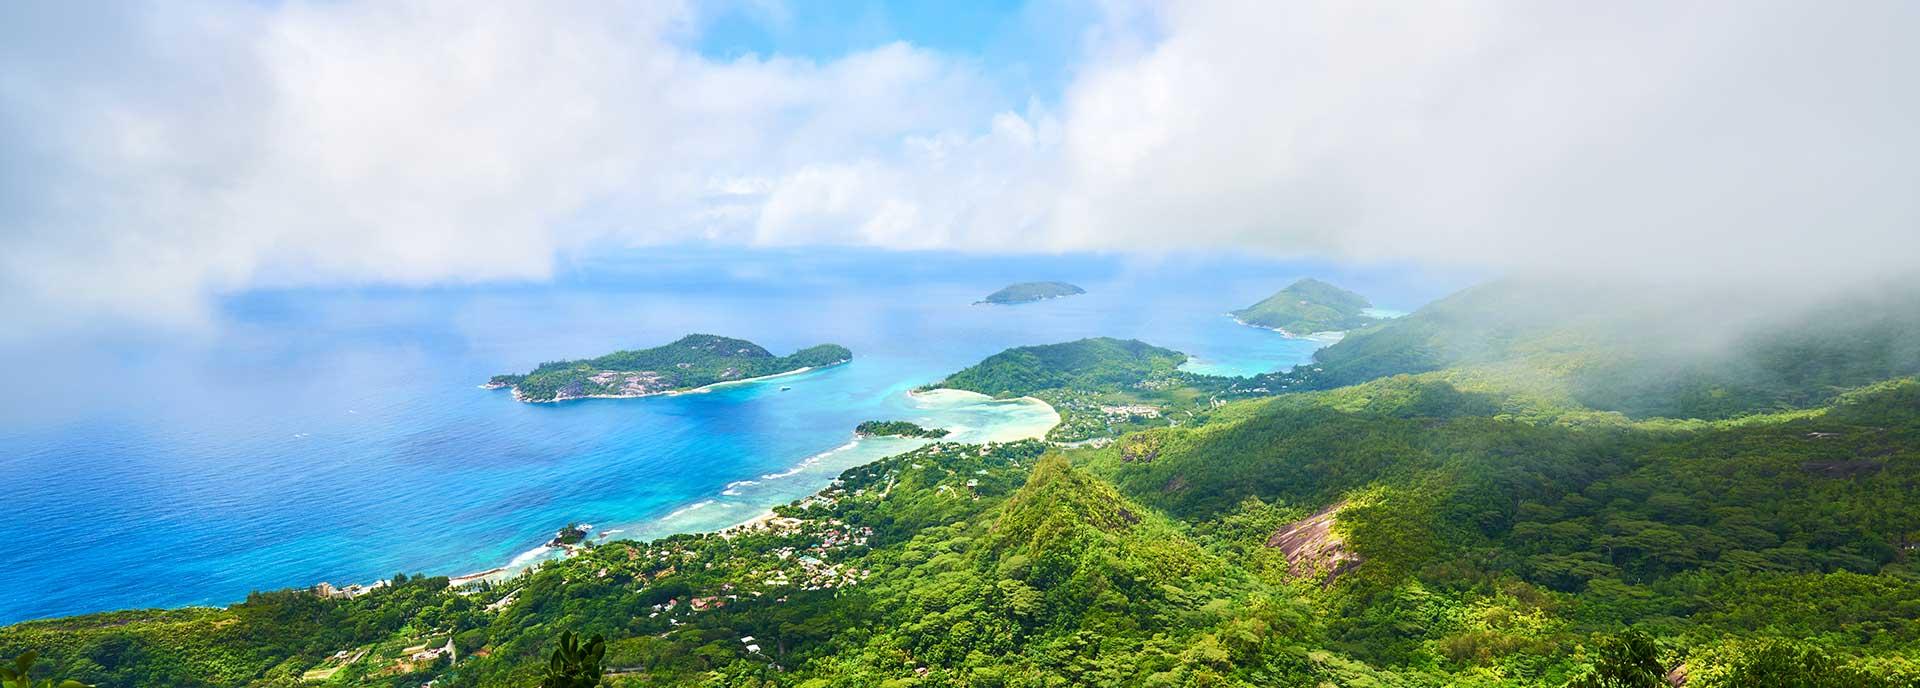 Pacotes de viagens Ilhas Seychelles